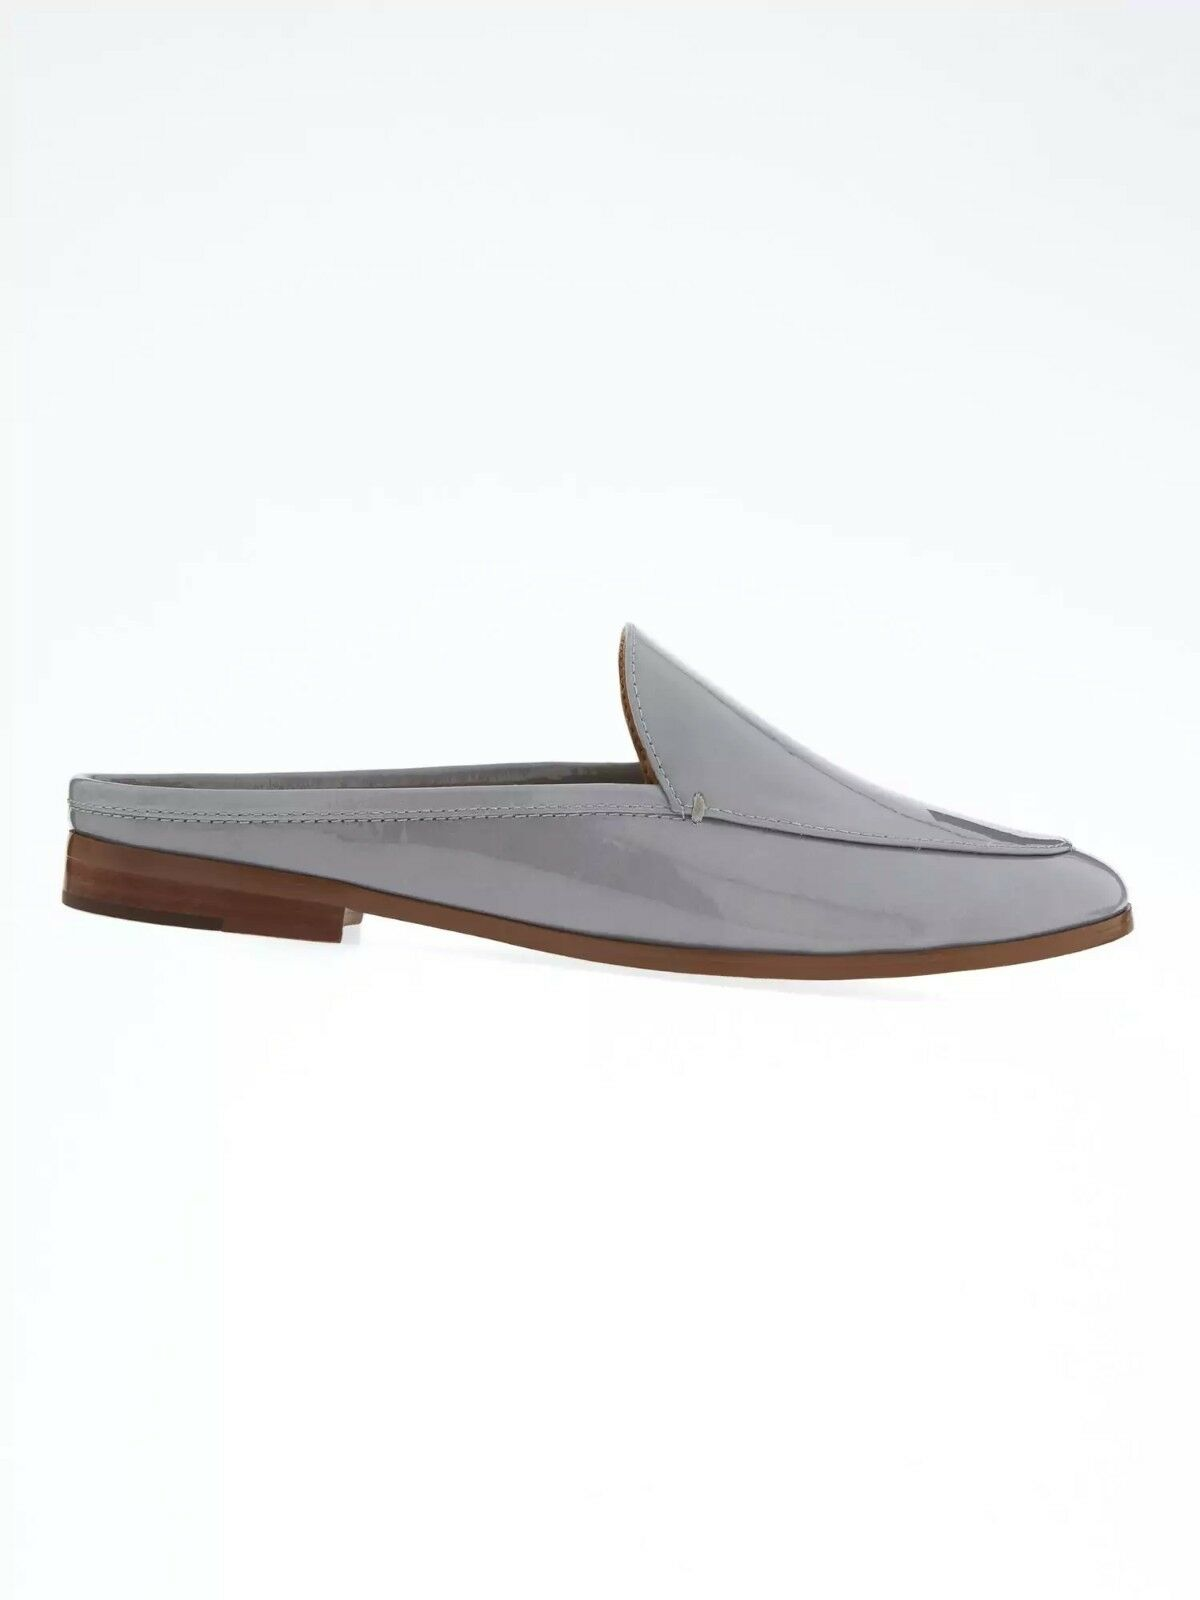 Banana Republic Demi Slide, Silver Grau SIZE 6.5      #671374 v611